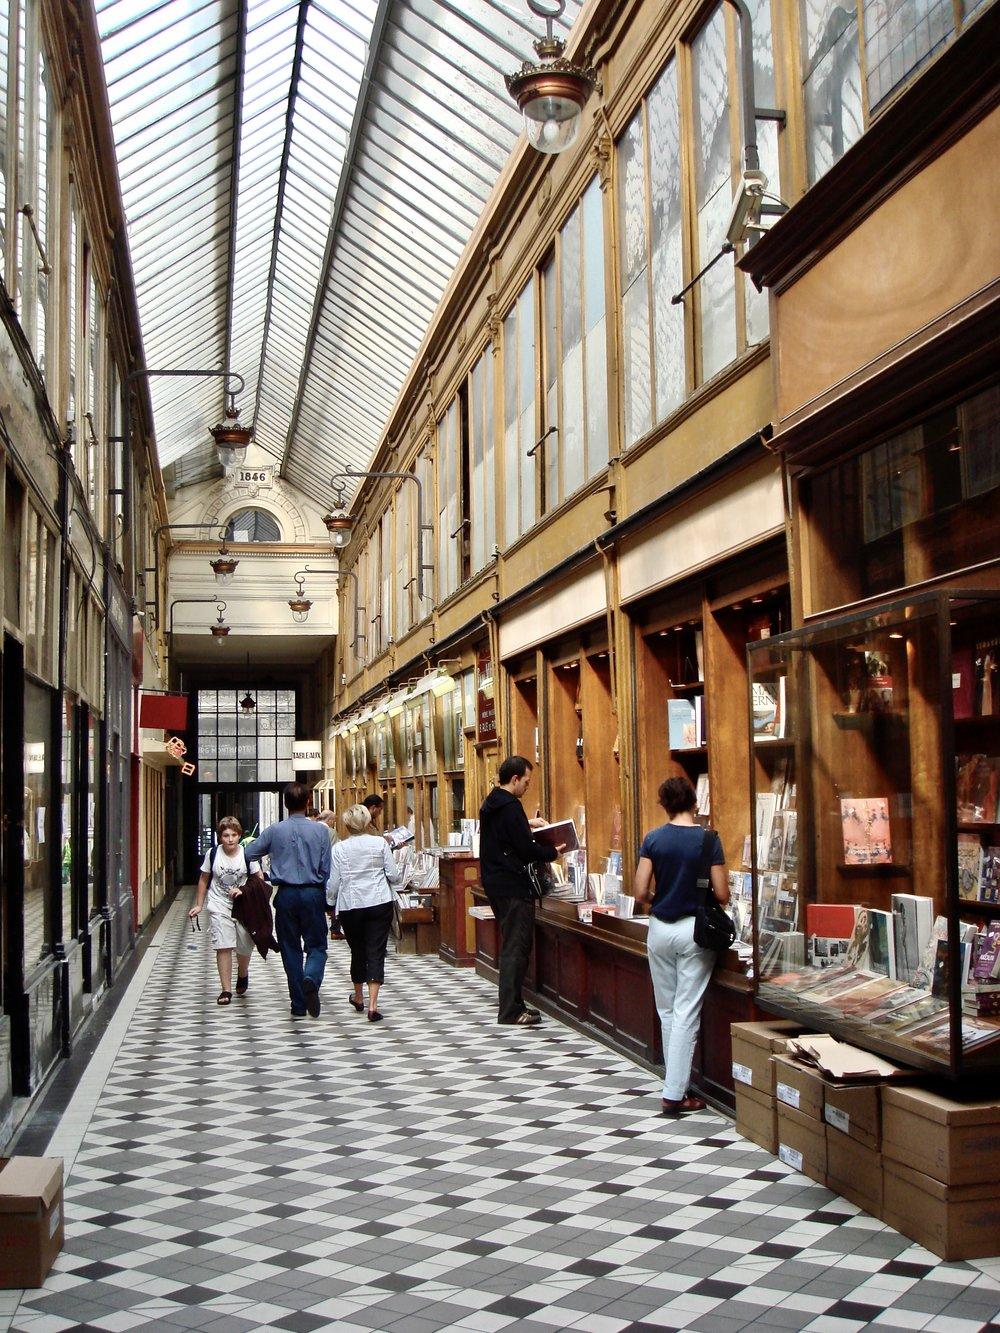 The Covered Passageways in Paris